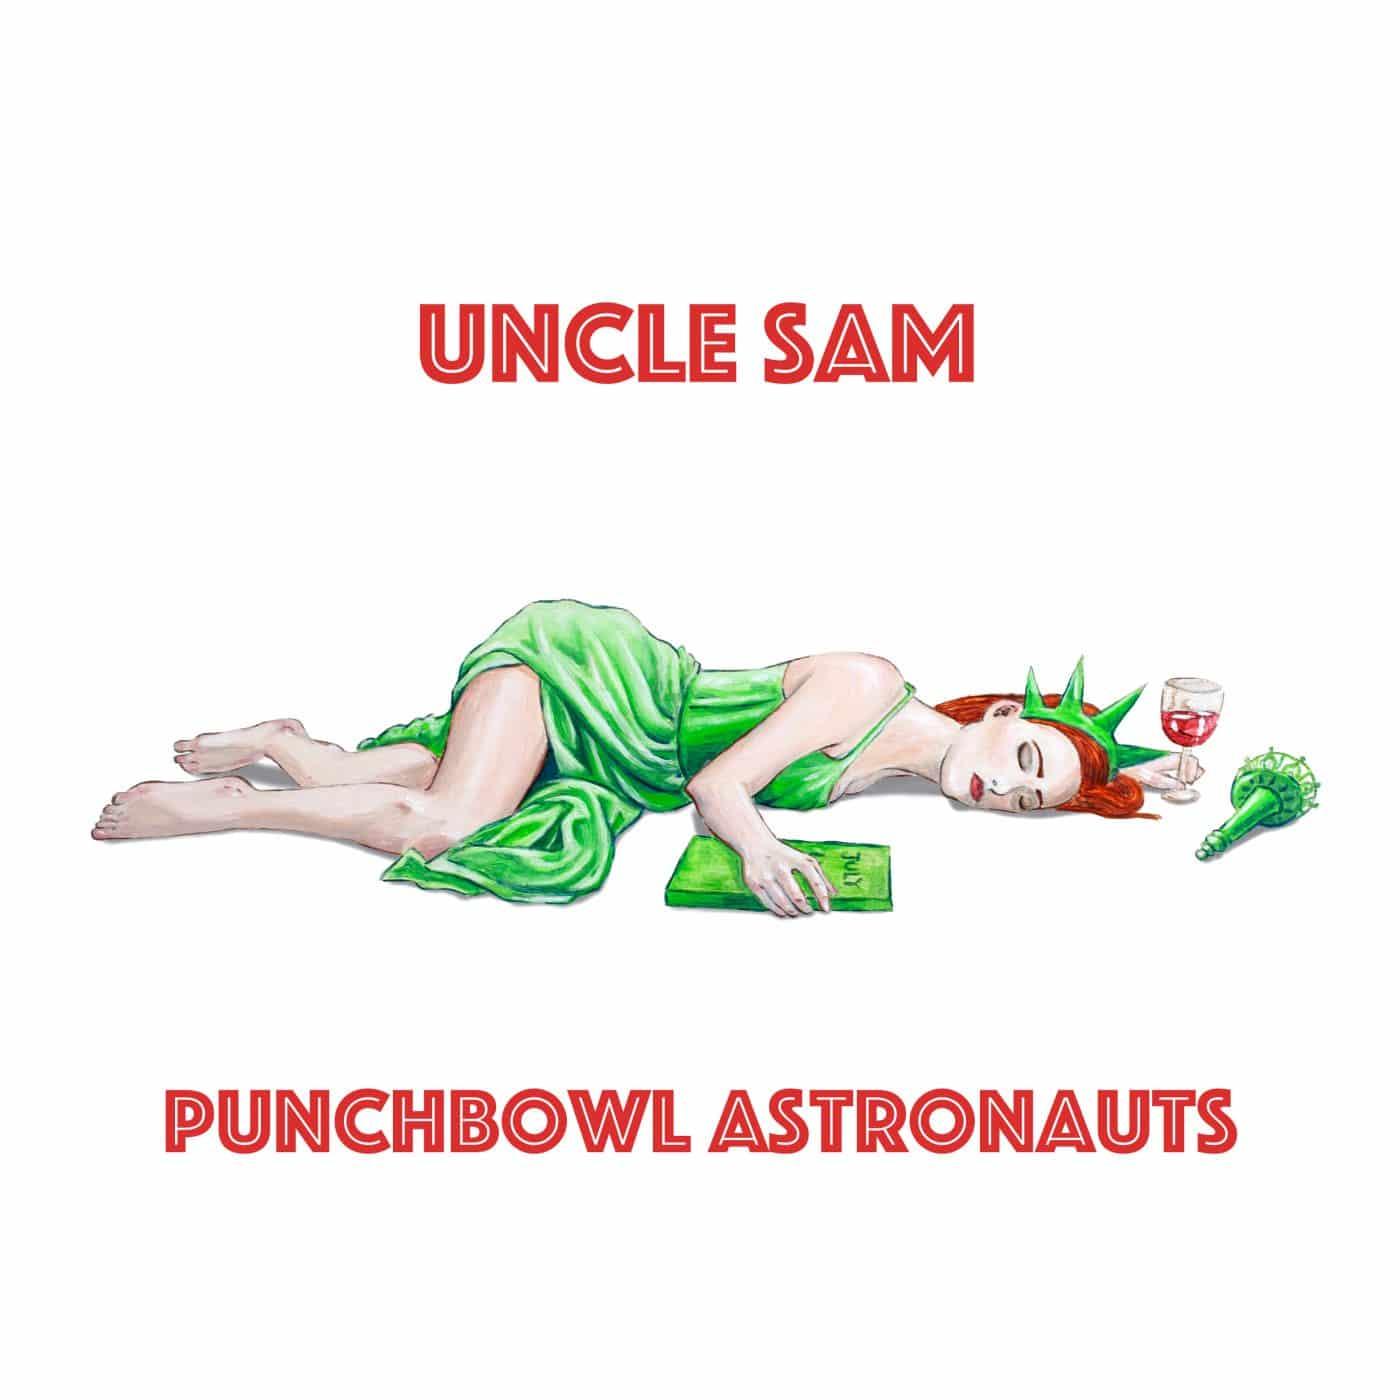 Punchbowl Astronauts - Uncle Sam